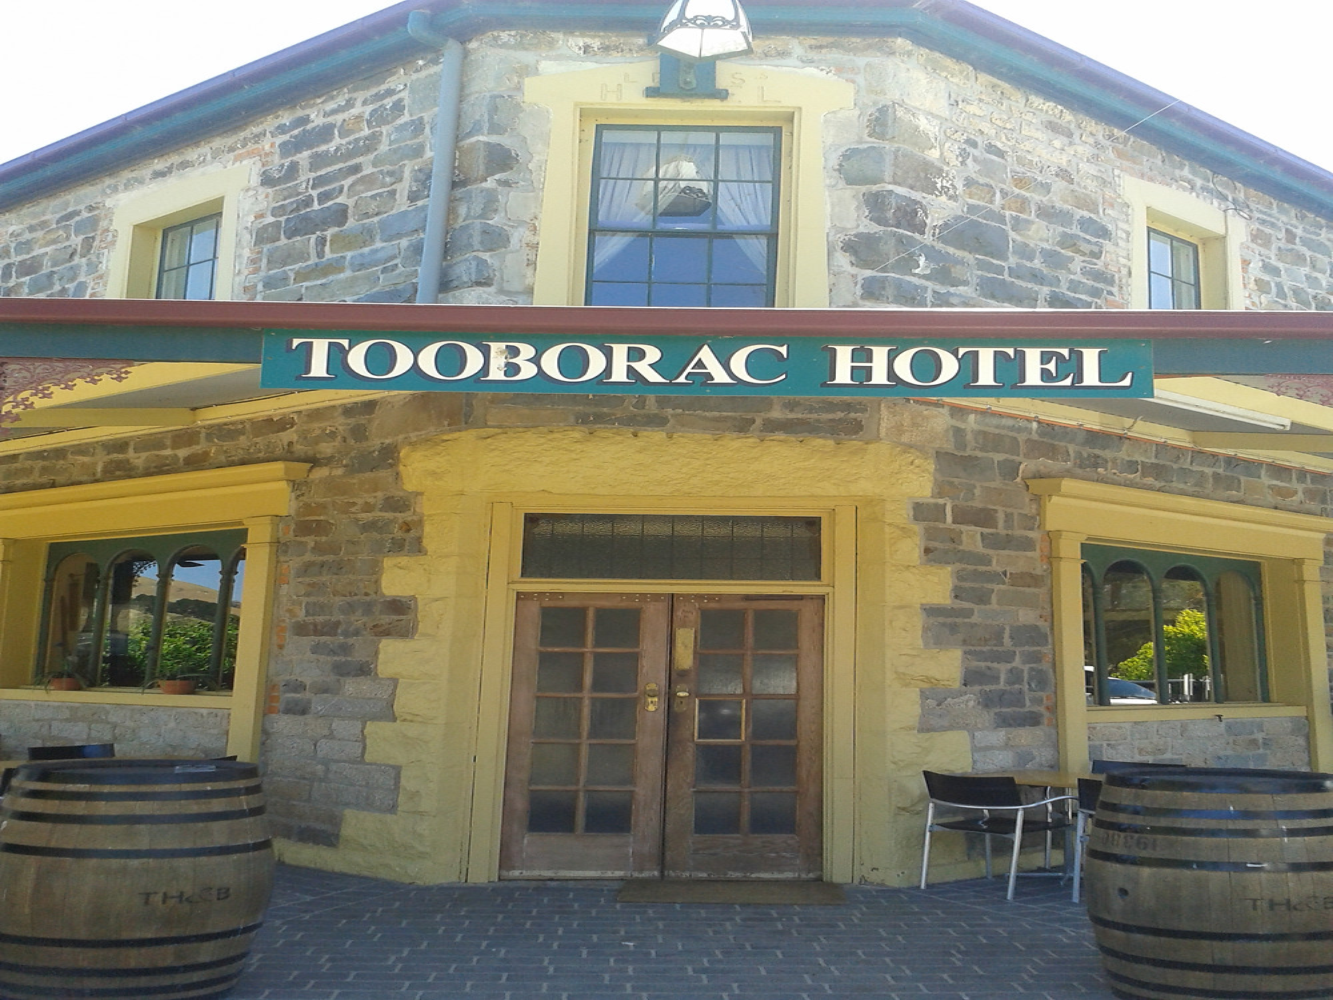 Tooborac hotel